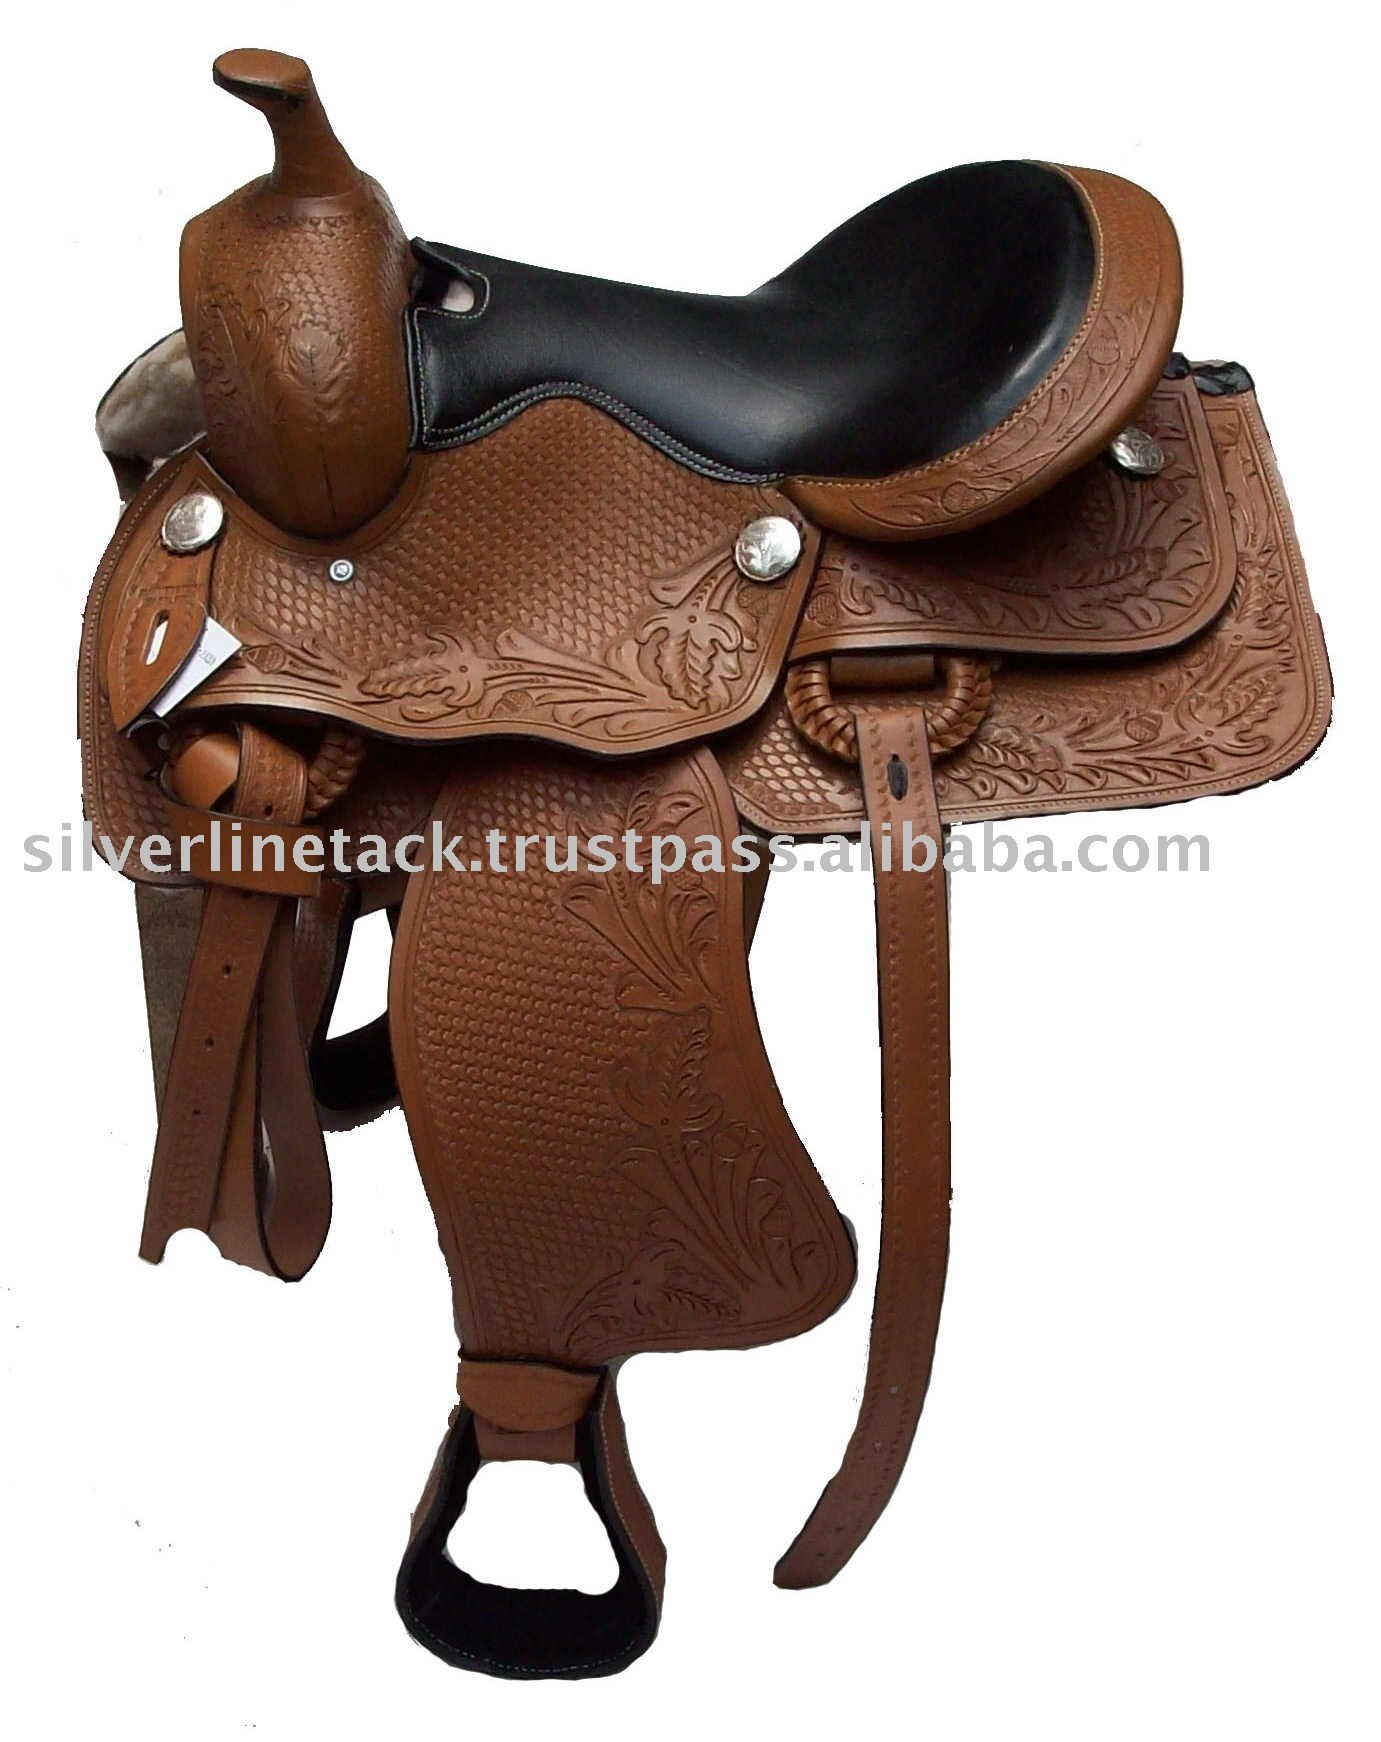 western saddles | Western Saddle, View western saddles ...